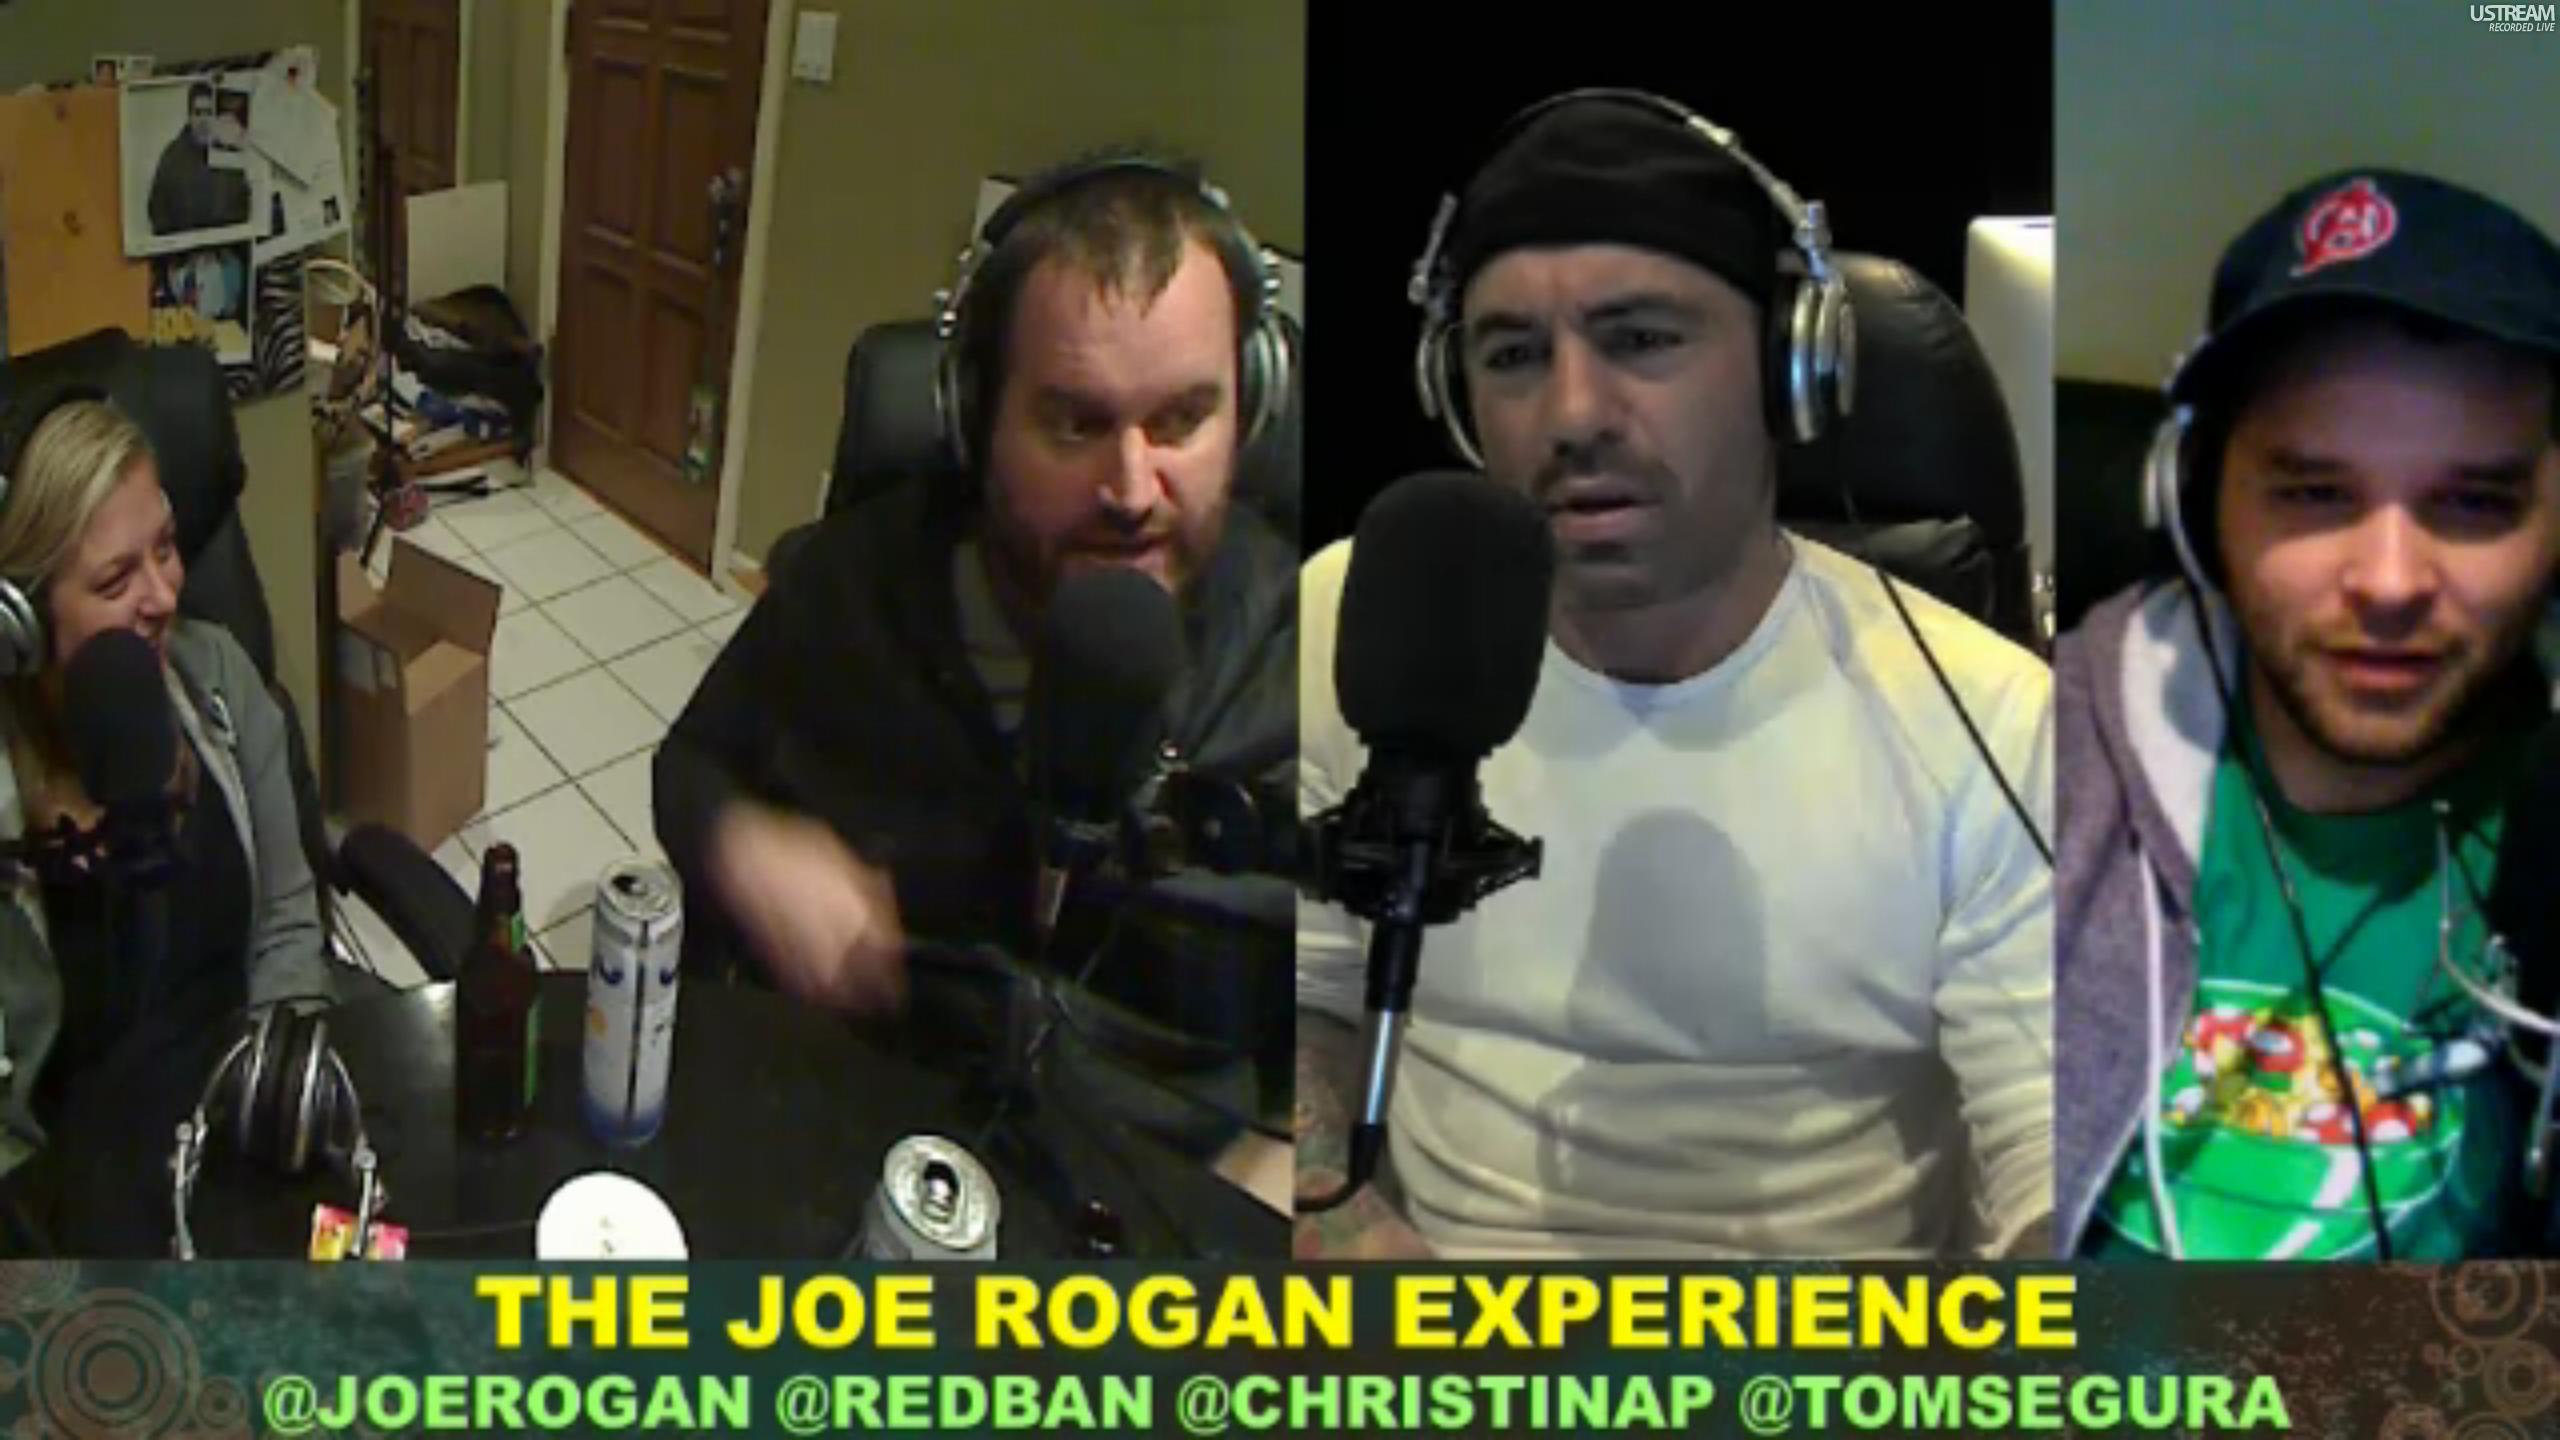 The Joe Rogan Experience PODCAST #157 - Tom Segura, Christina Pazsitzky, Brian Redban